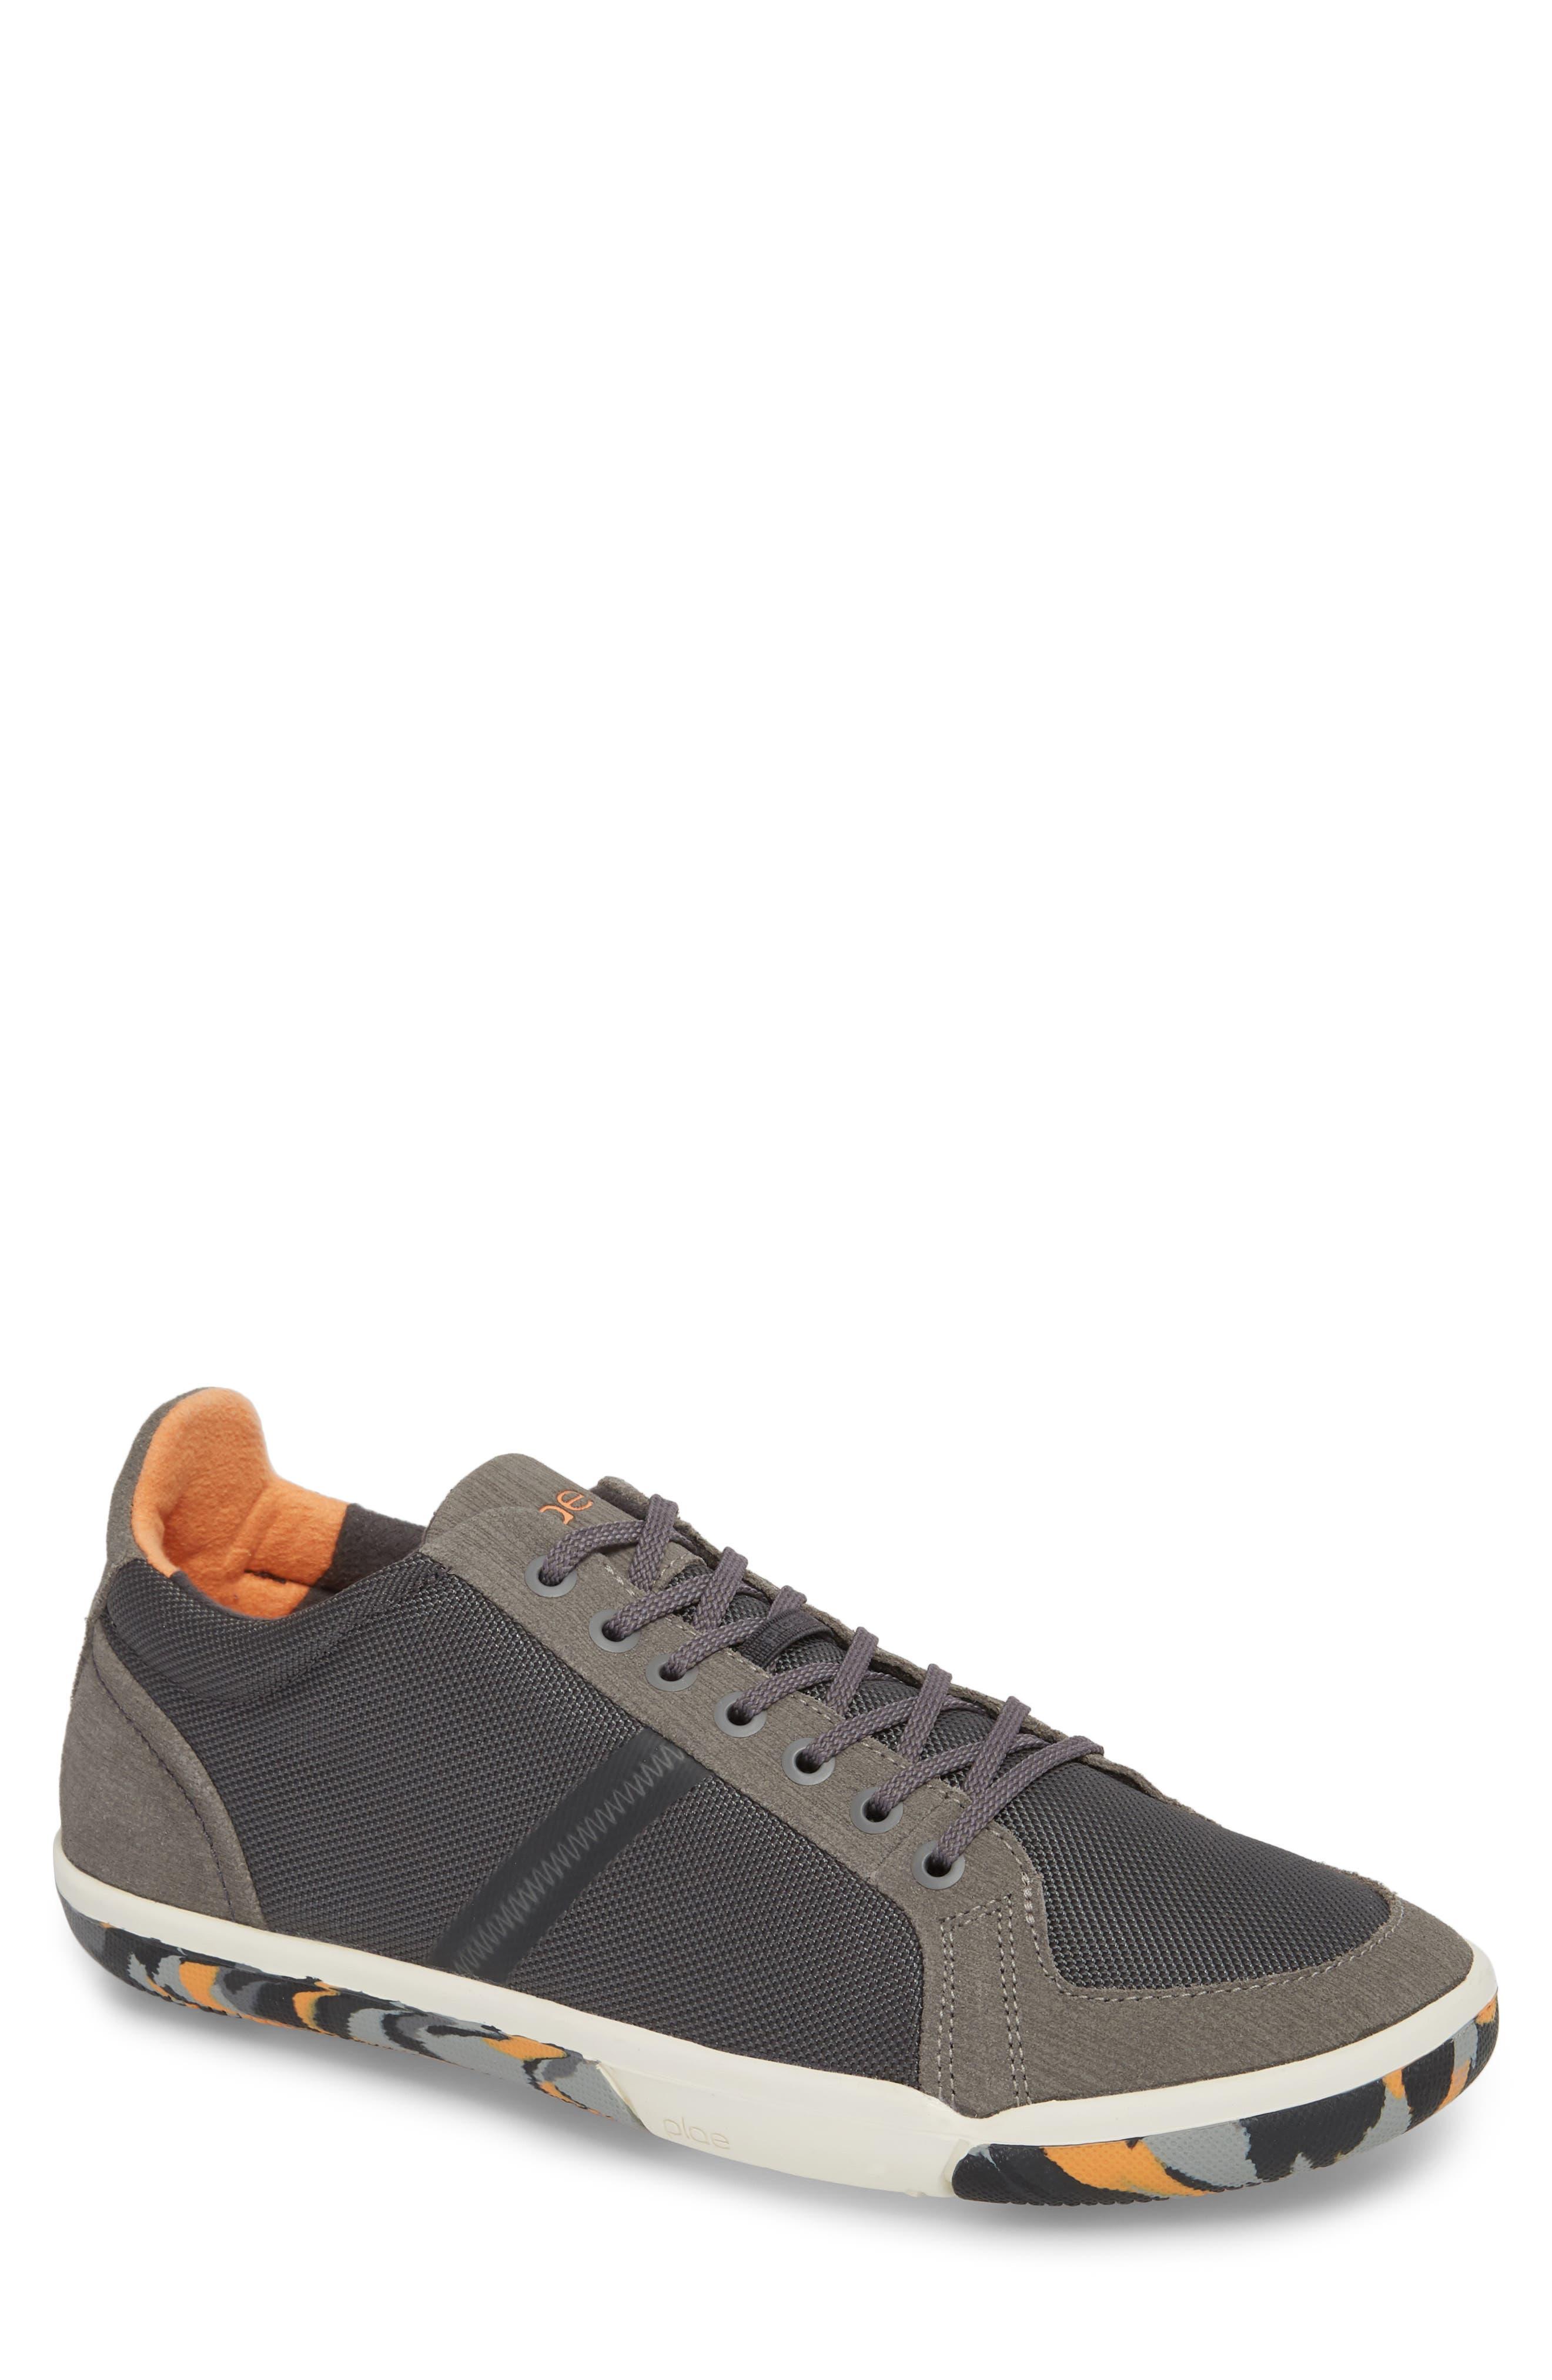 Prospect Low Top Sneaker,                             Main thumbnail 1, color,                             070